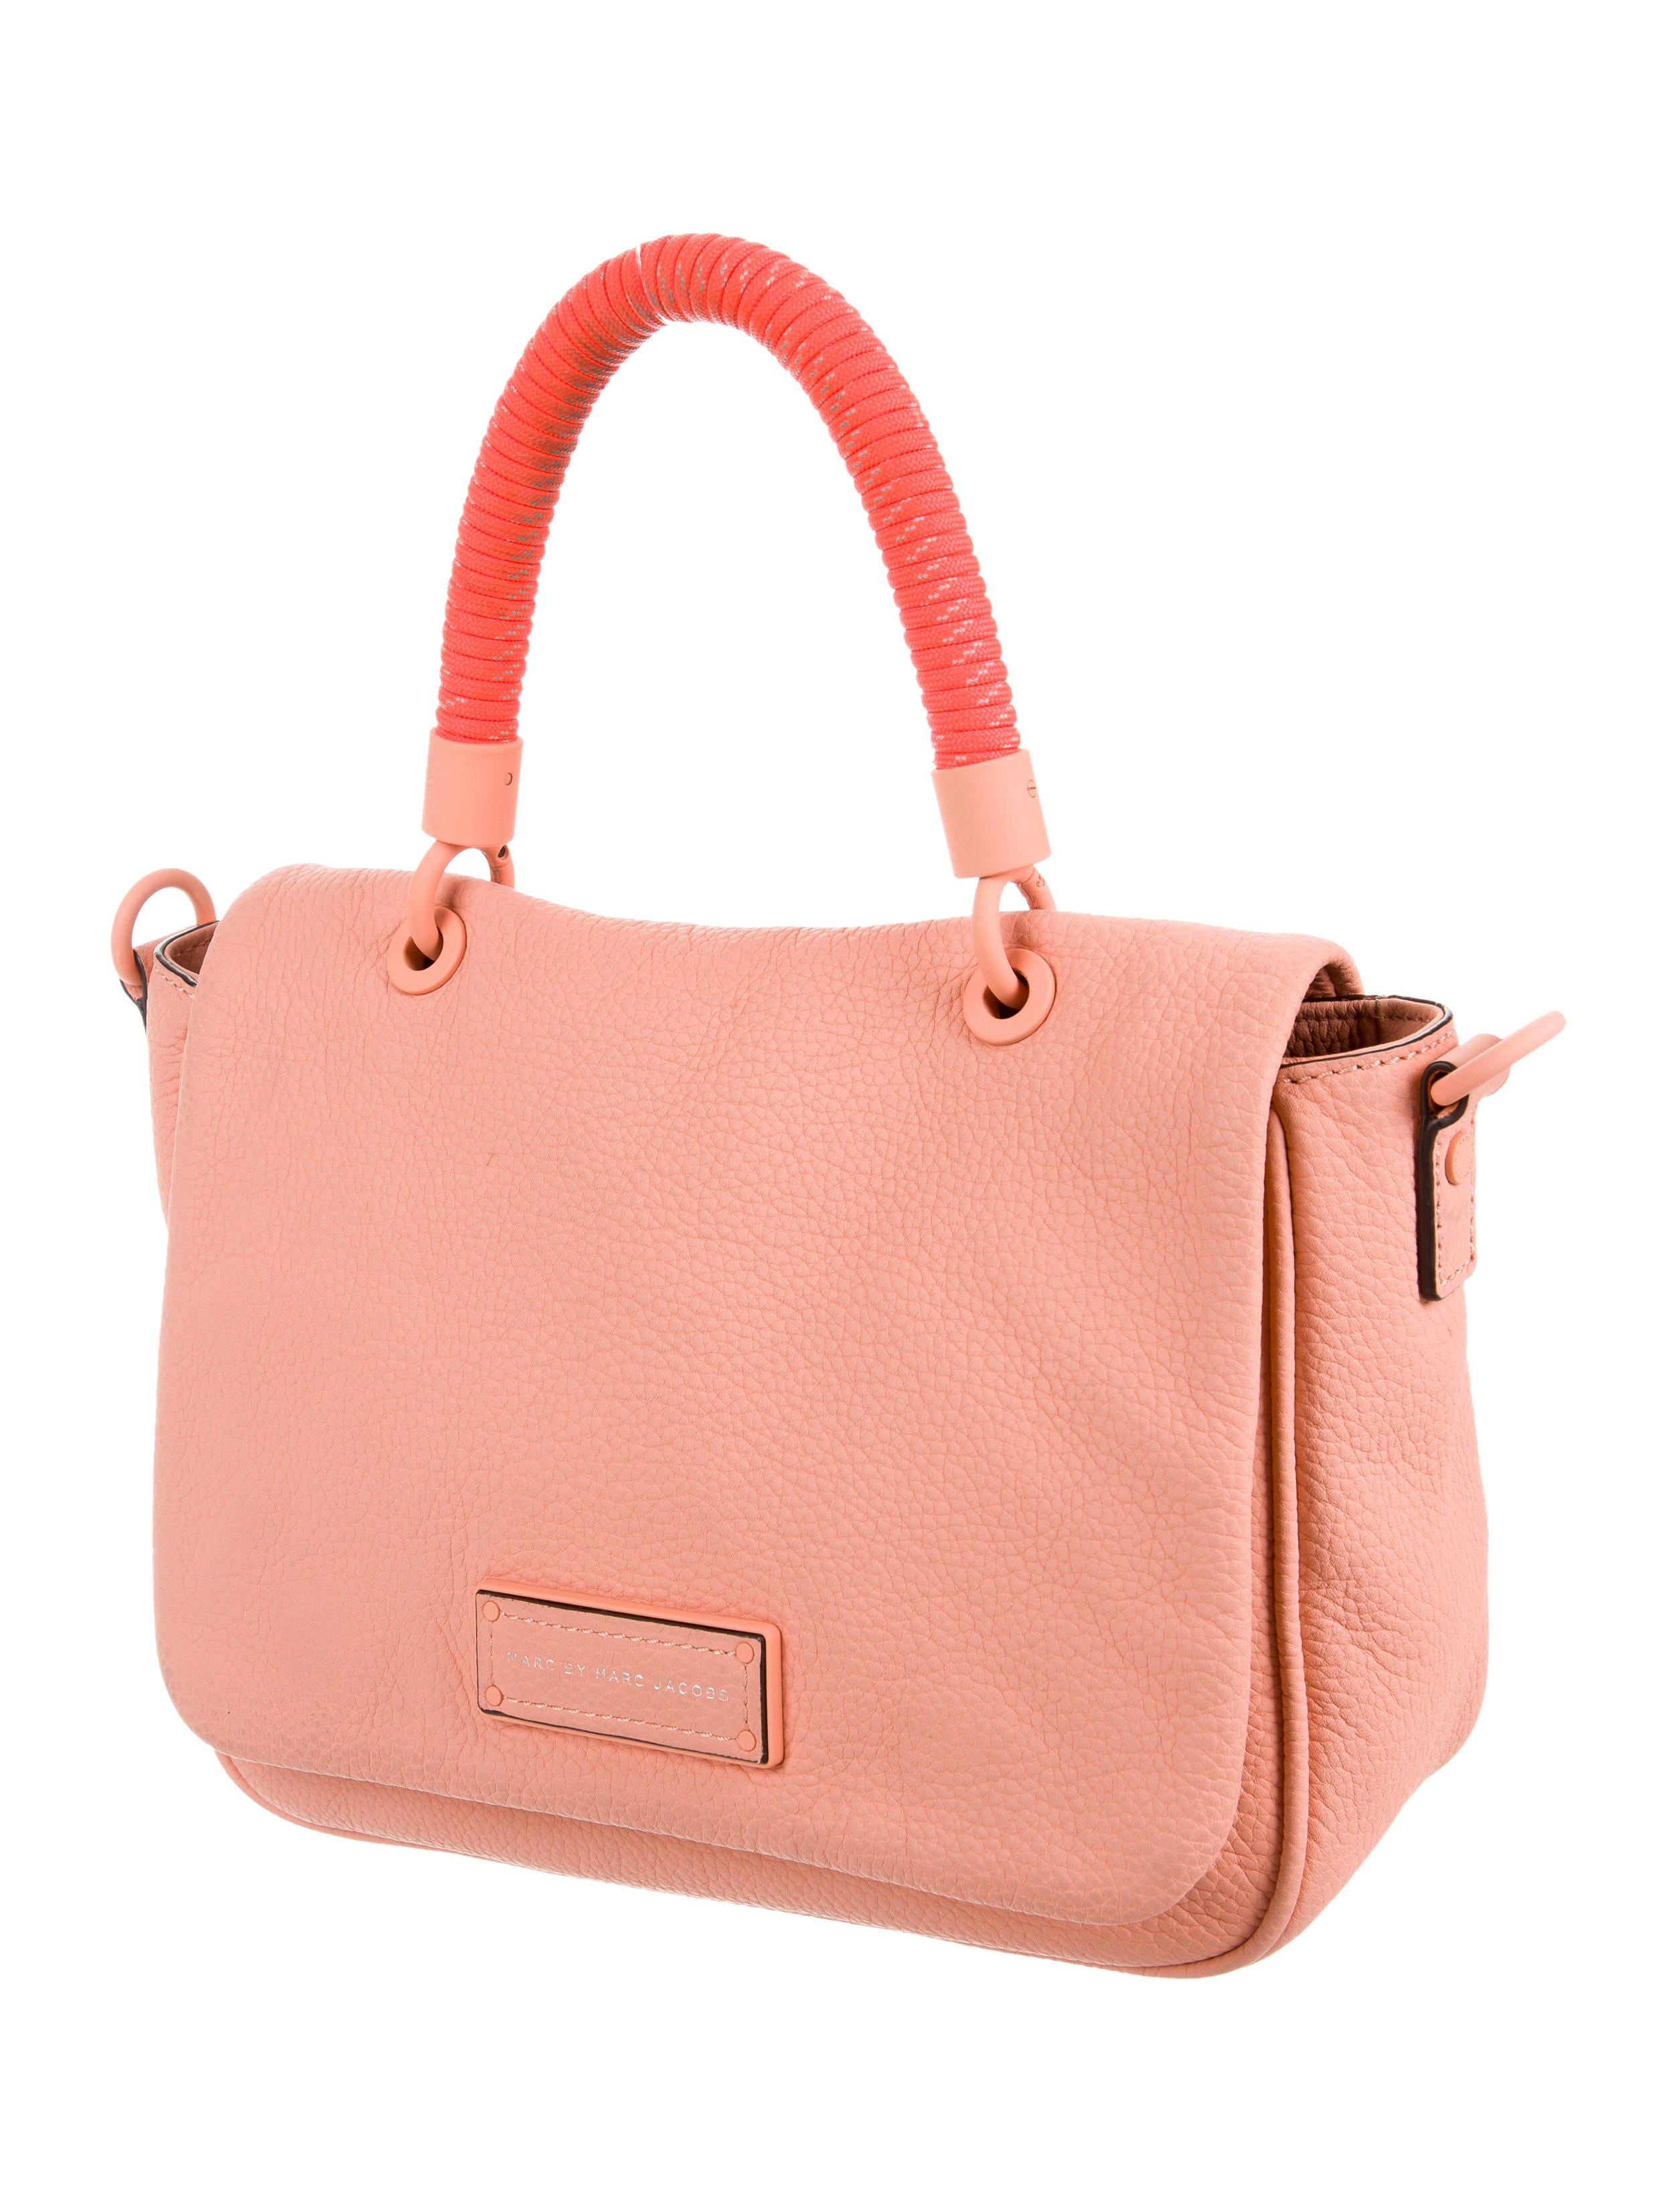 marc by marc jacobs grained leather satchel handbags. Black Bedroom Furniture Sets. Home Design Ideas